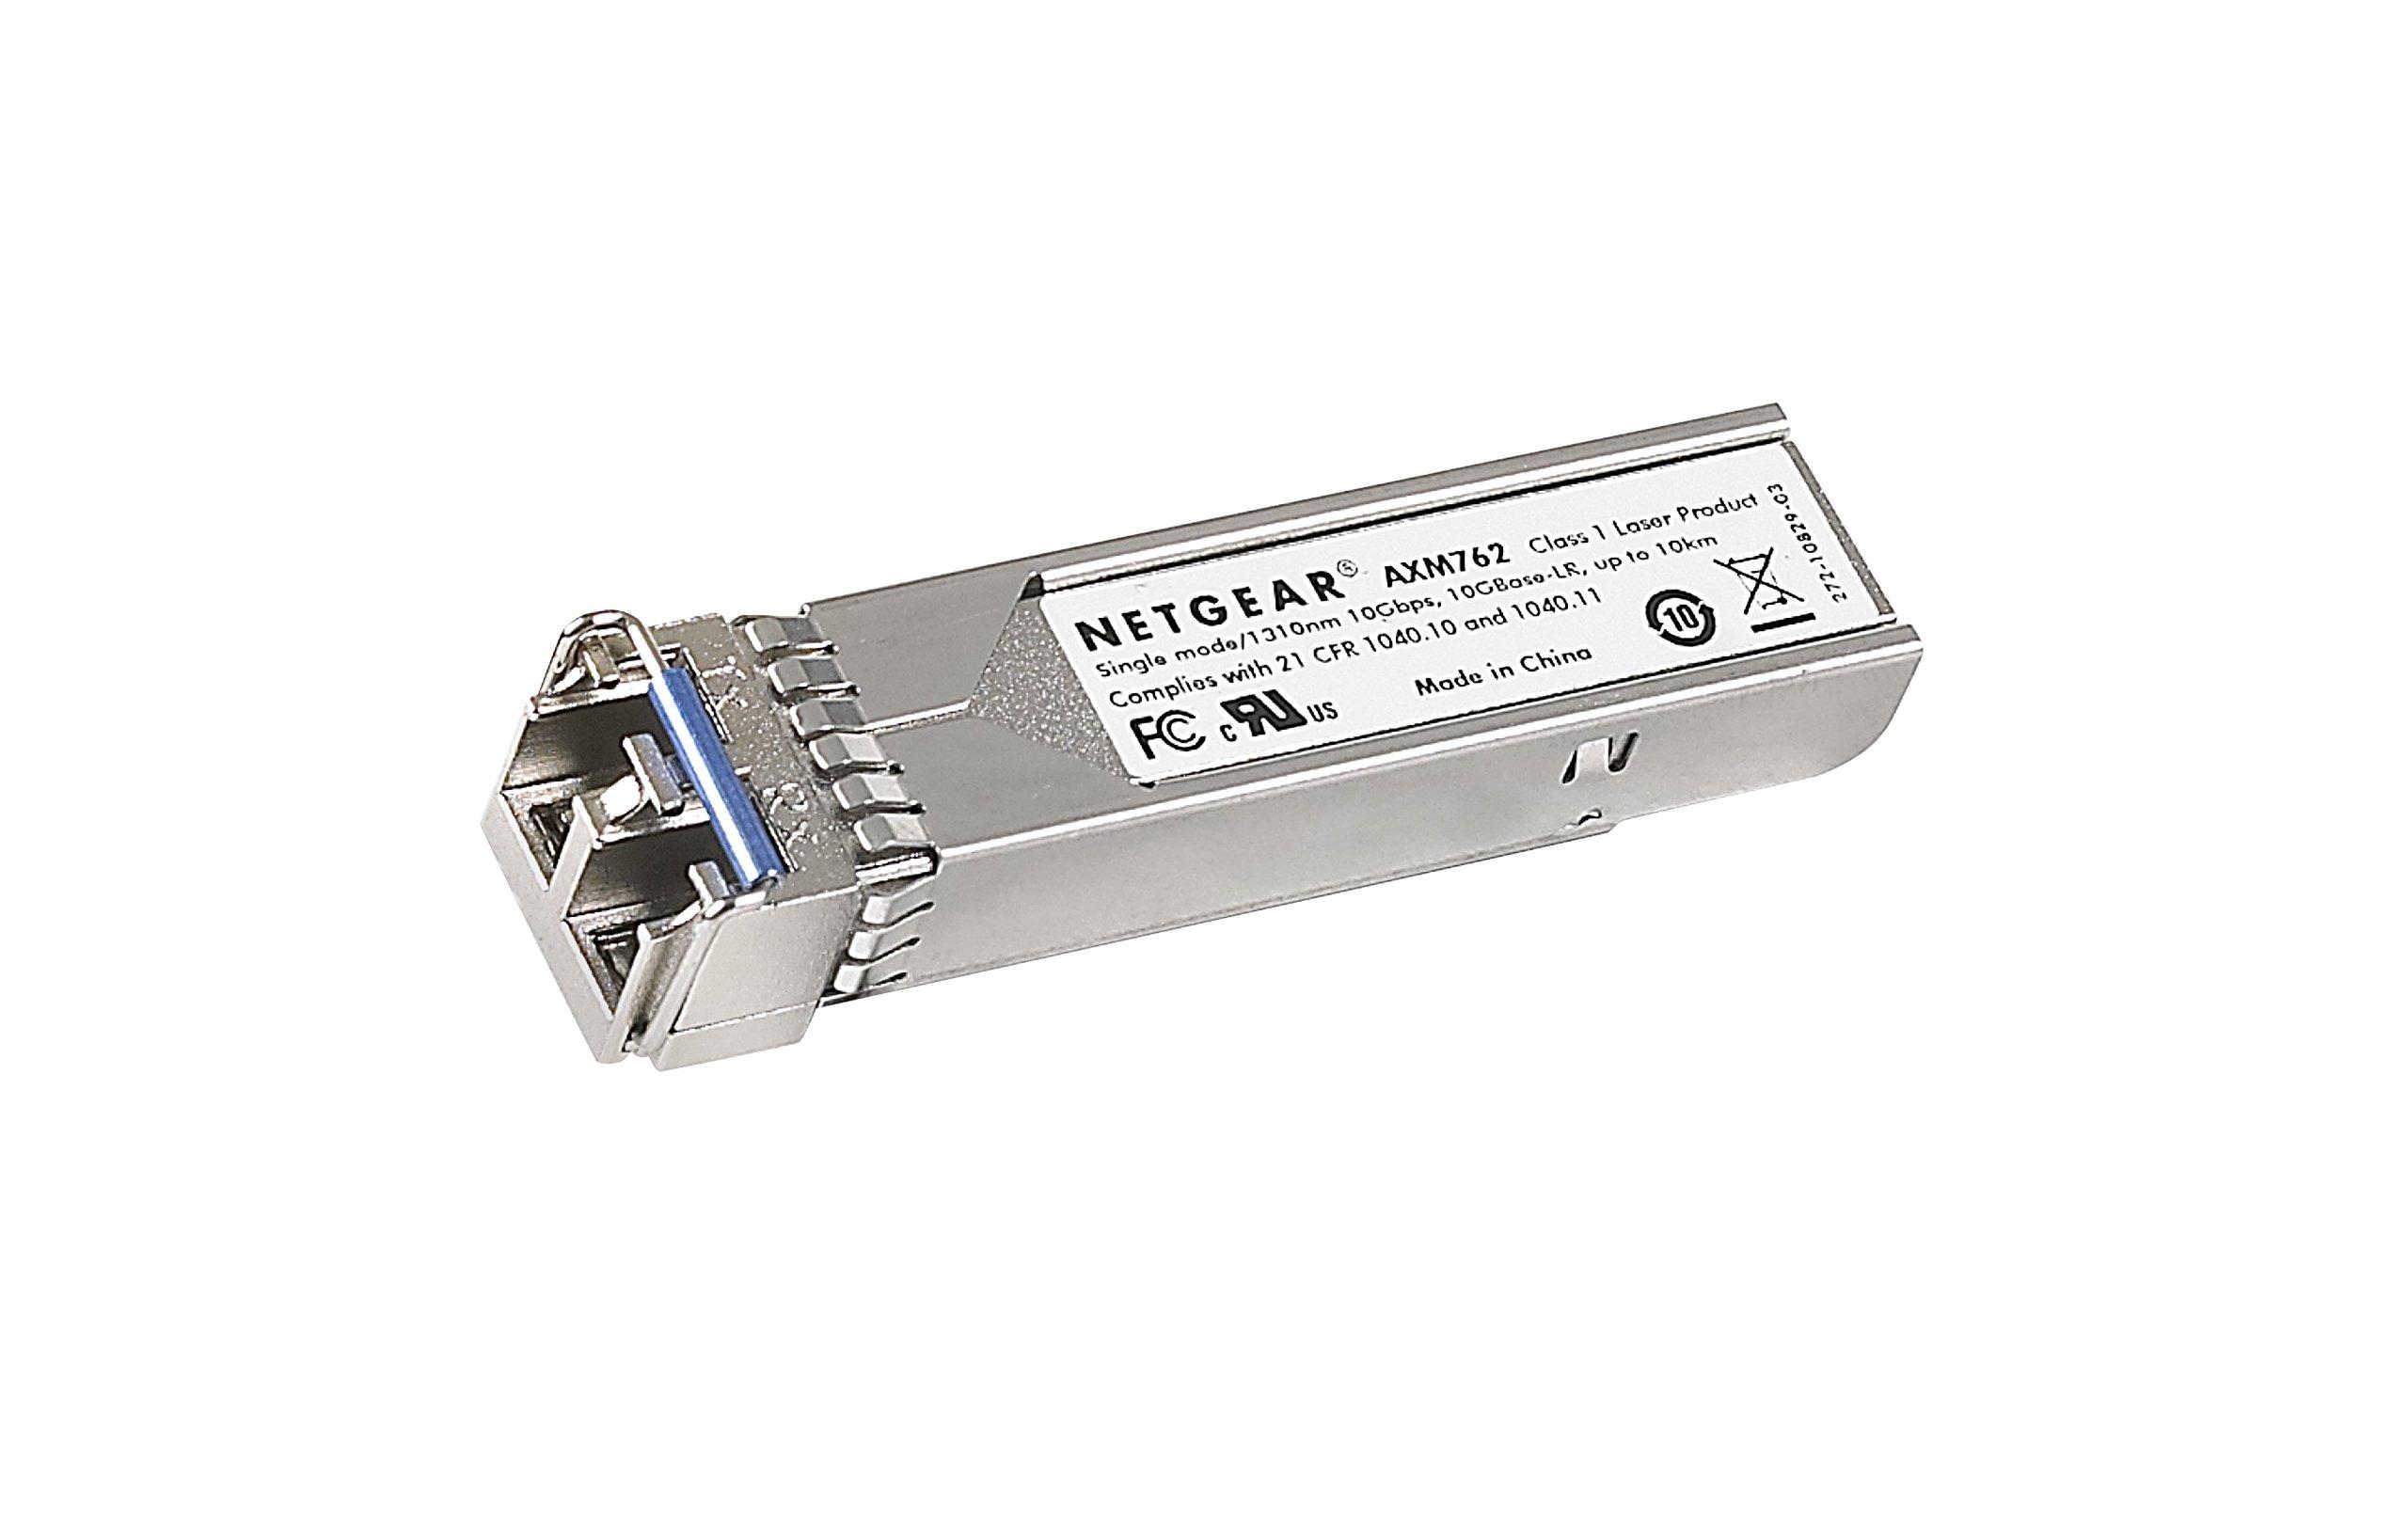 NETGEAR ProSAFE 10GBASE-LR SFP+ LC GBIC (AXM762-10000S) by NETGEAR